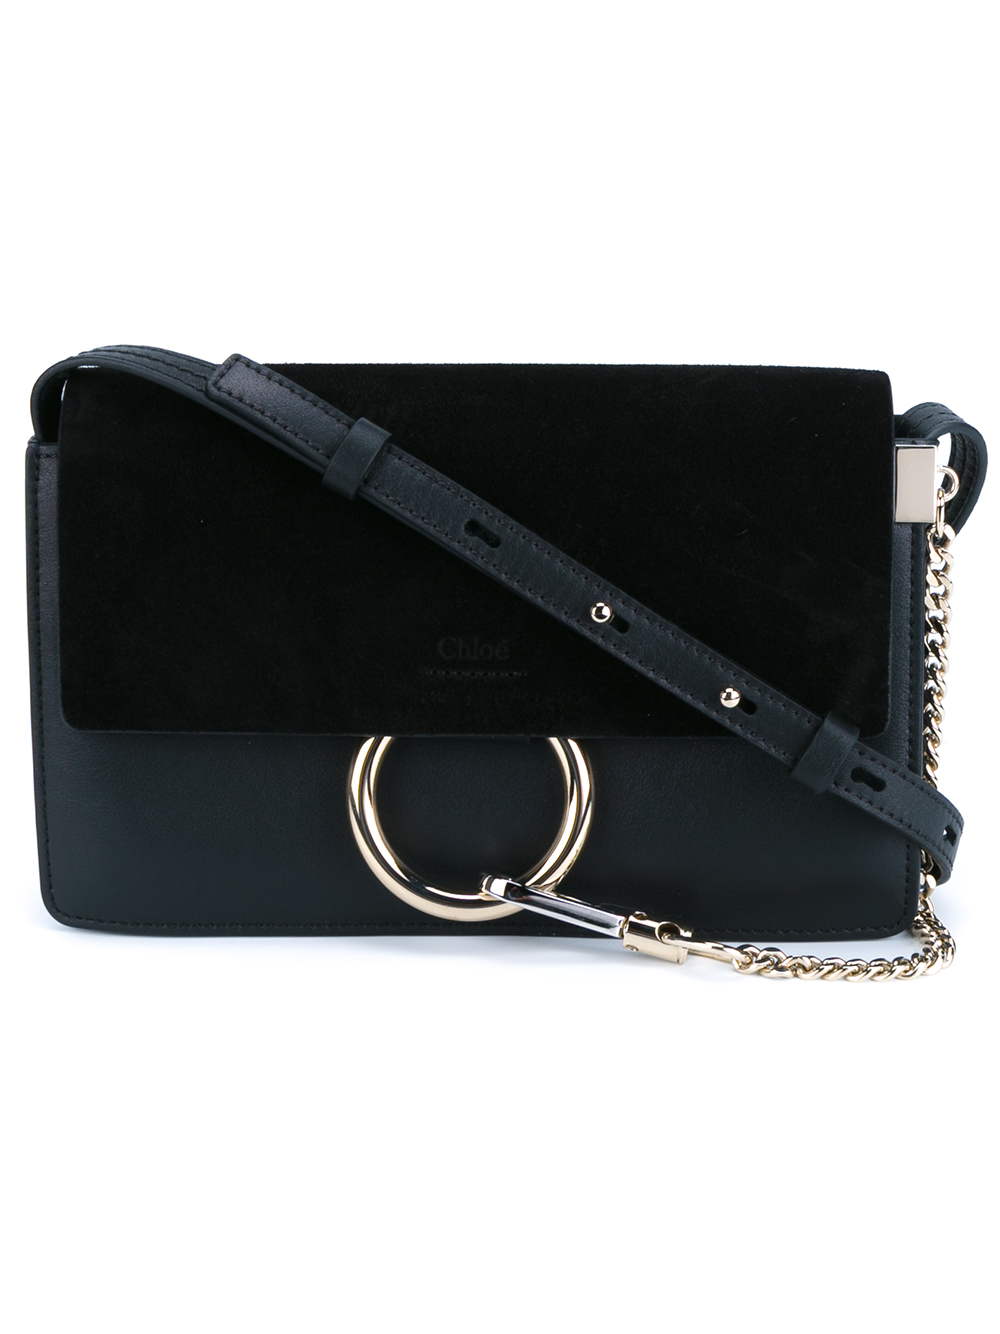 how to clean suede handbag